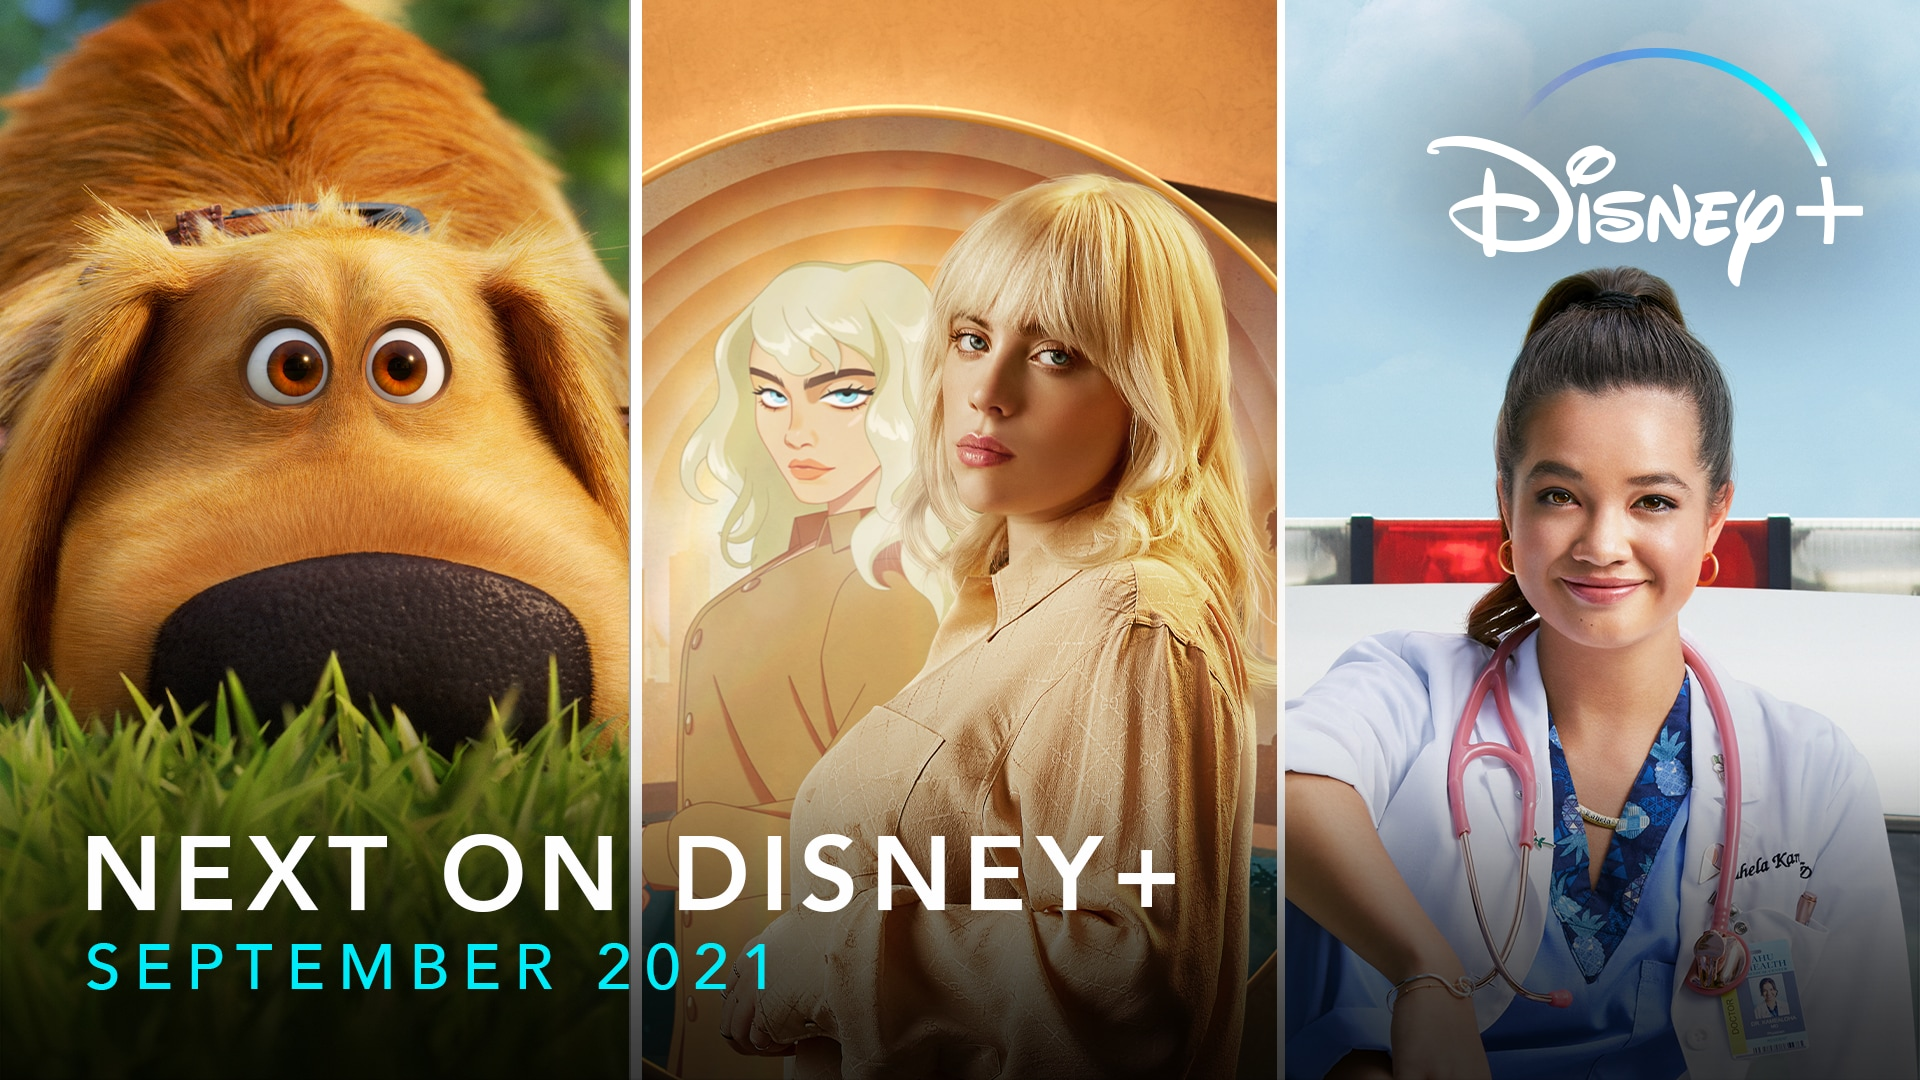 Next On Disney+ - September 2021| Disney+